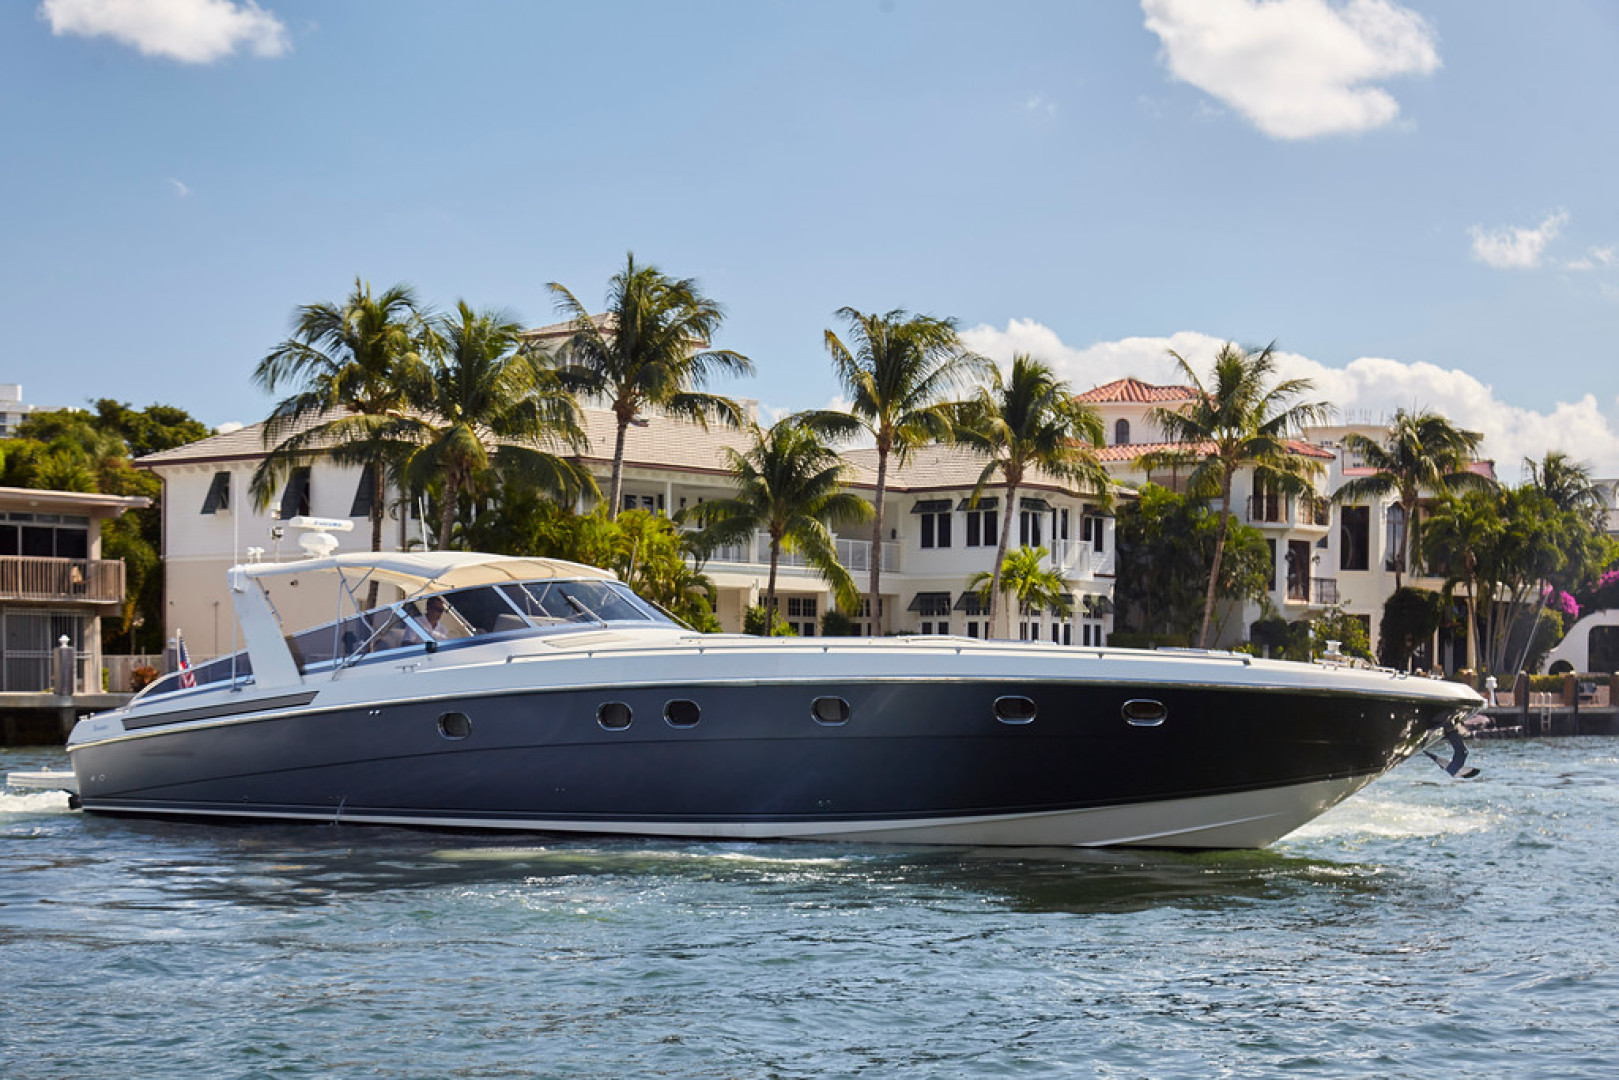 Baia-Sports Cruiser 1998 -Fort Lauderdale-Florida-United States-1275574 | Thumbnail